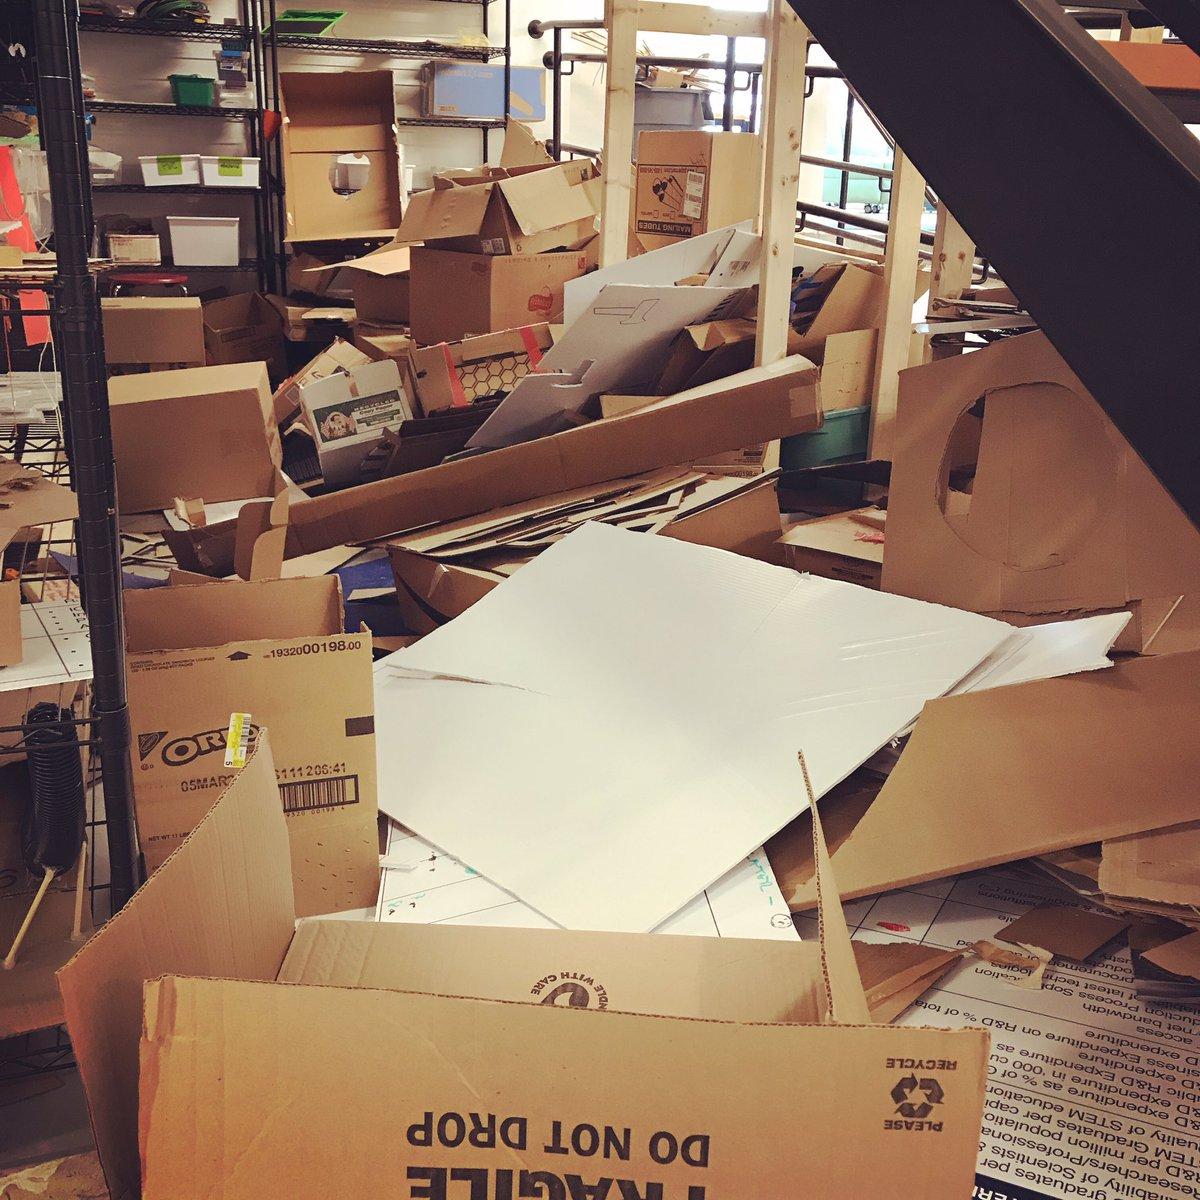 I think we've reached peak cardboard 😳 #ilab #innovationlab #makerspace #cardboard